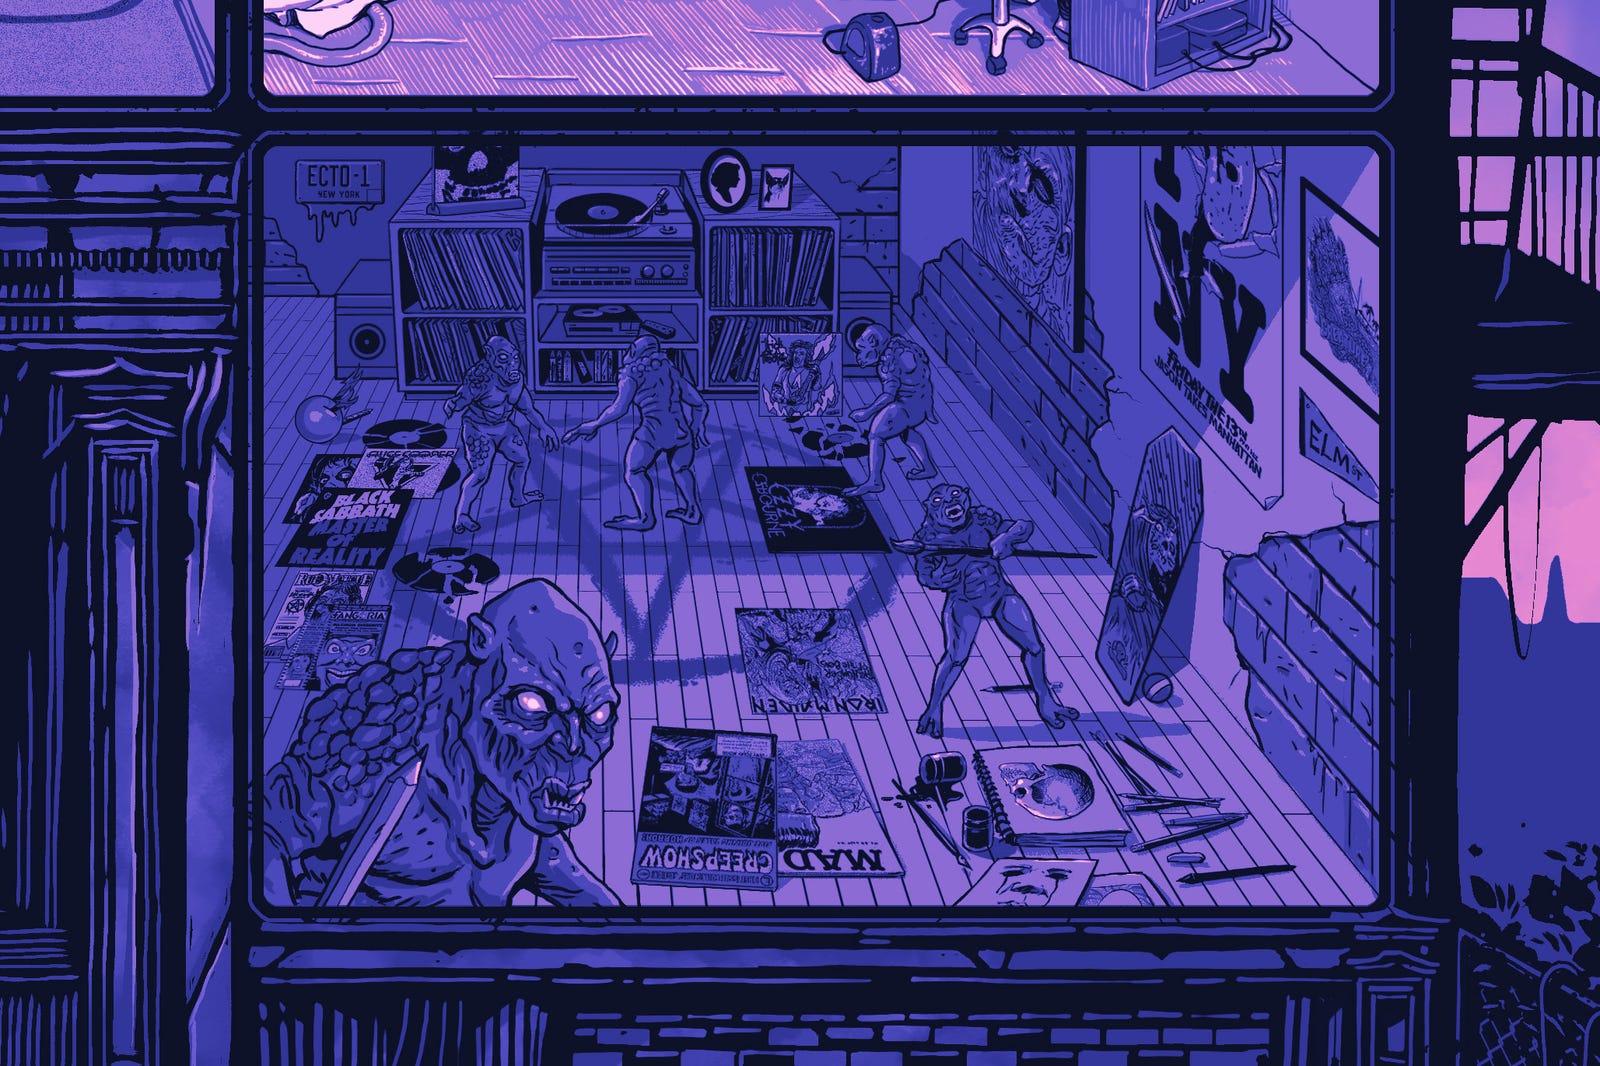 Gary Pullin's room.